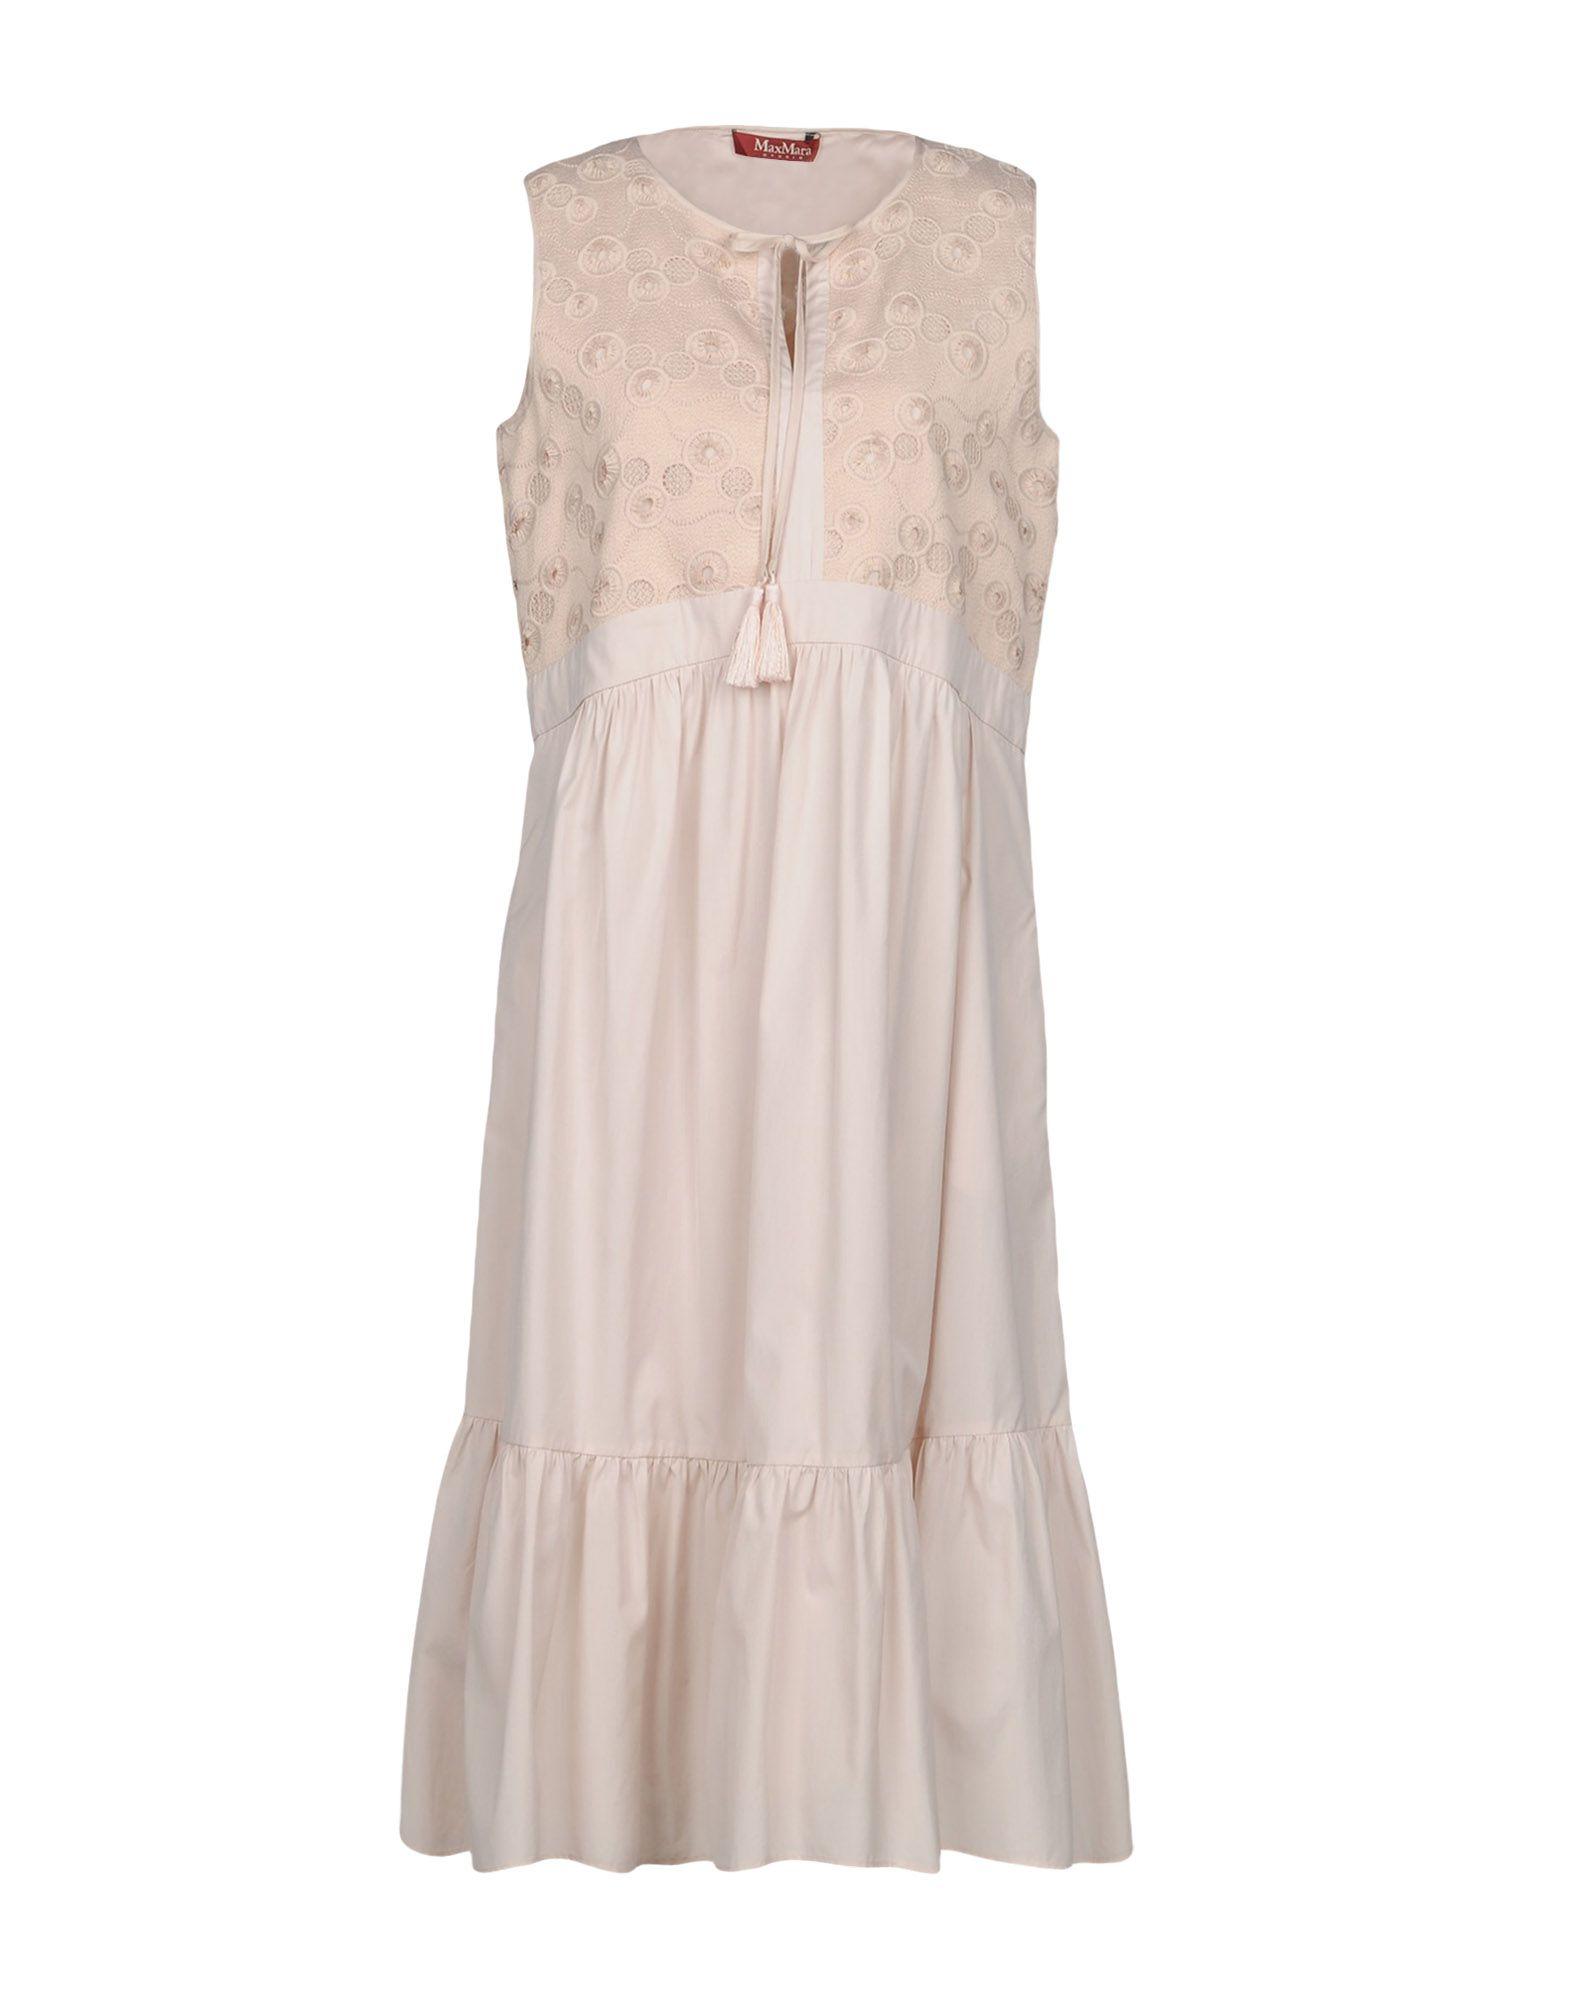 8f2c83ad434 Max Mara Knee-Length Dress In Beige